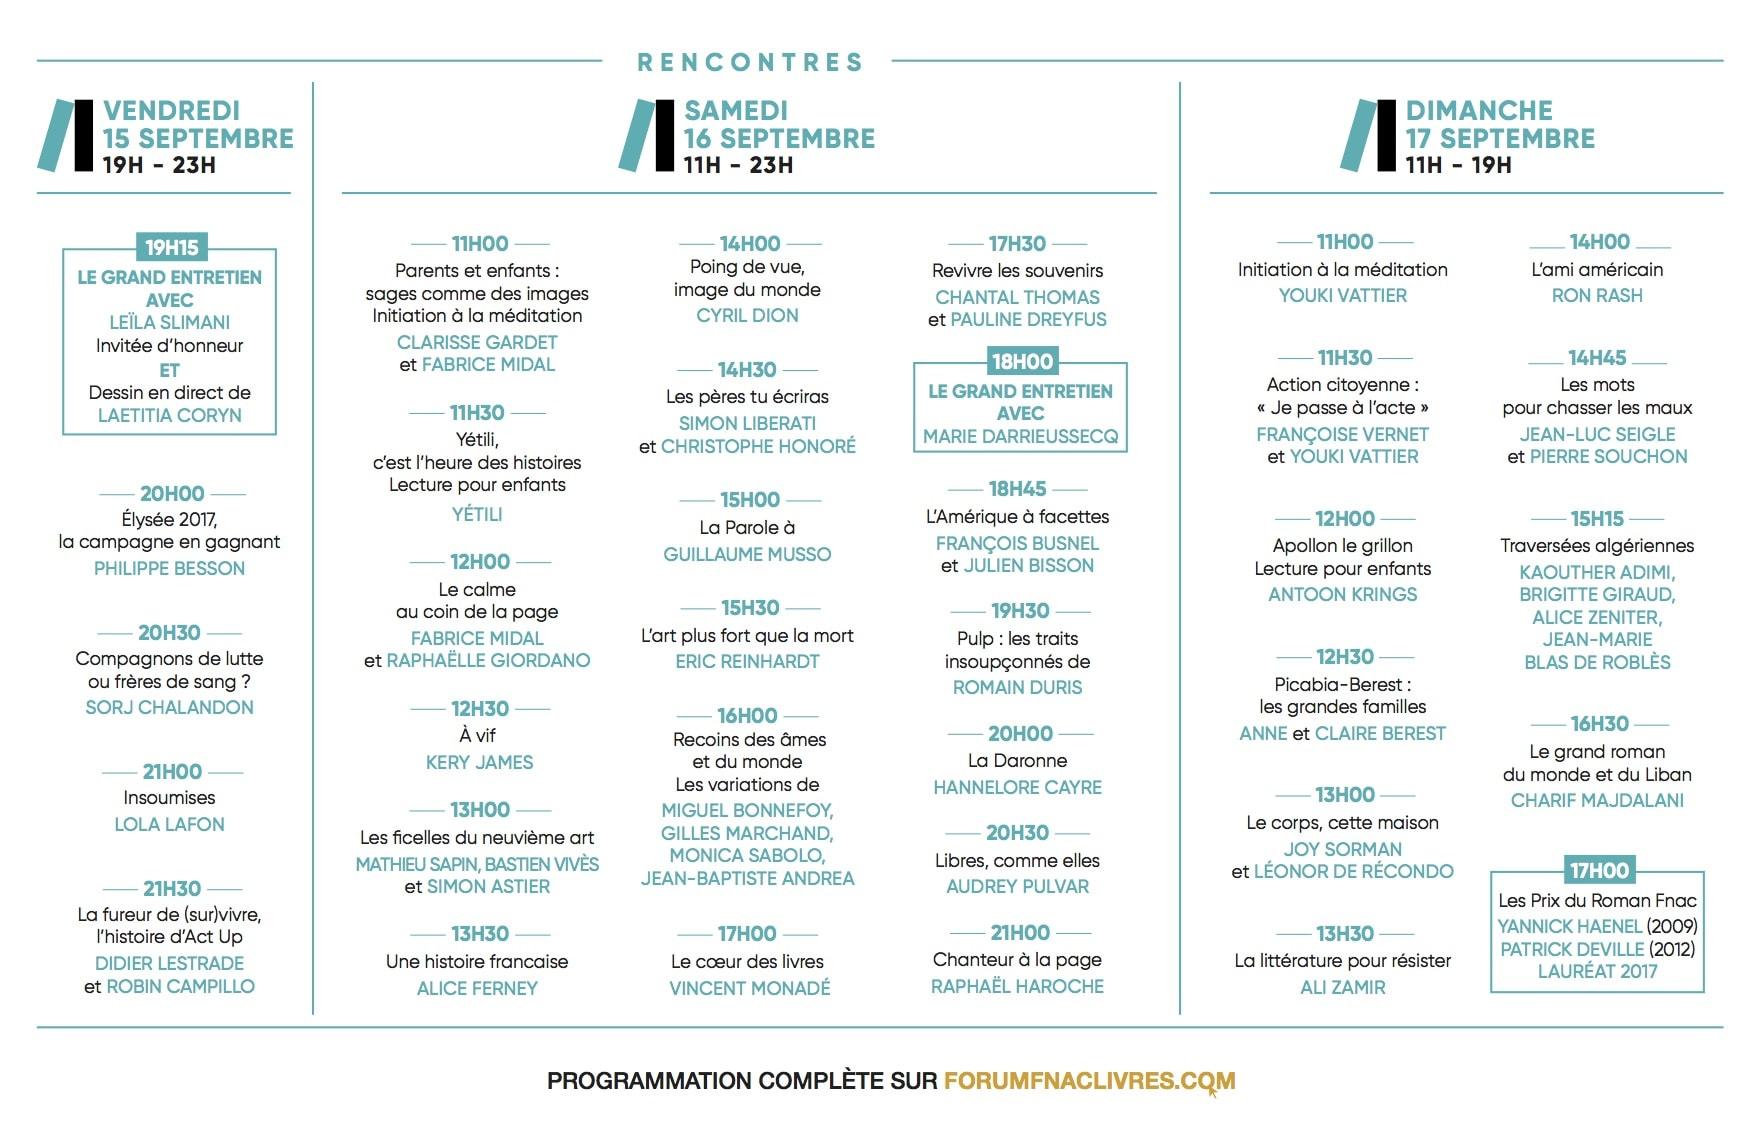 FORUM FNAC LIVRES 2017 programme